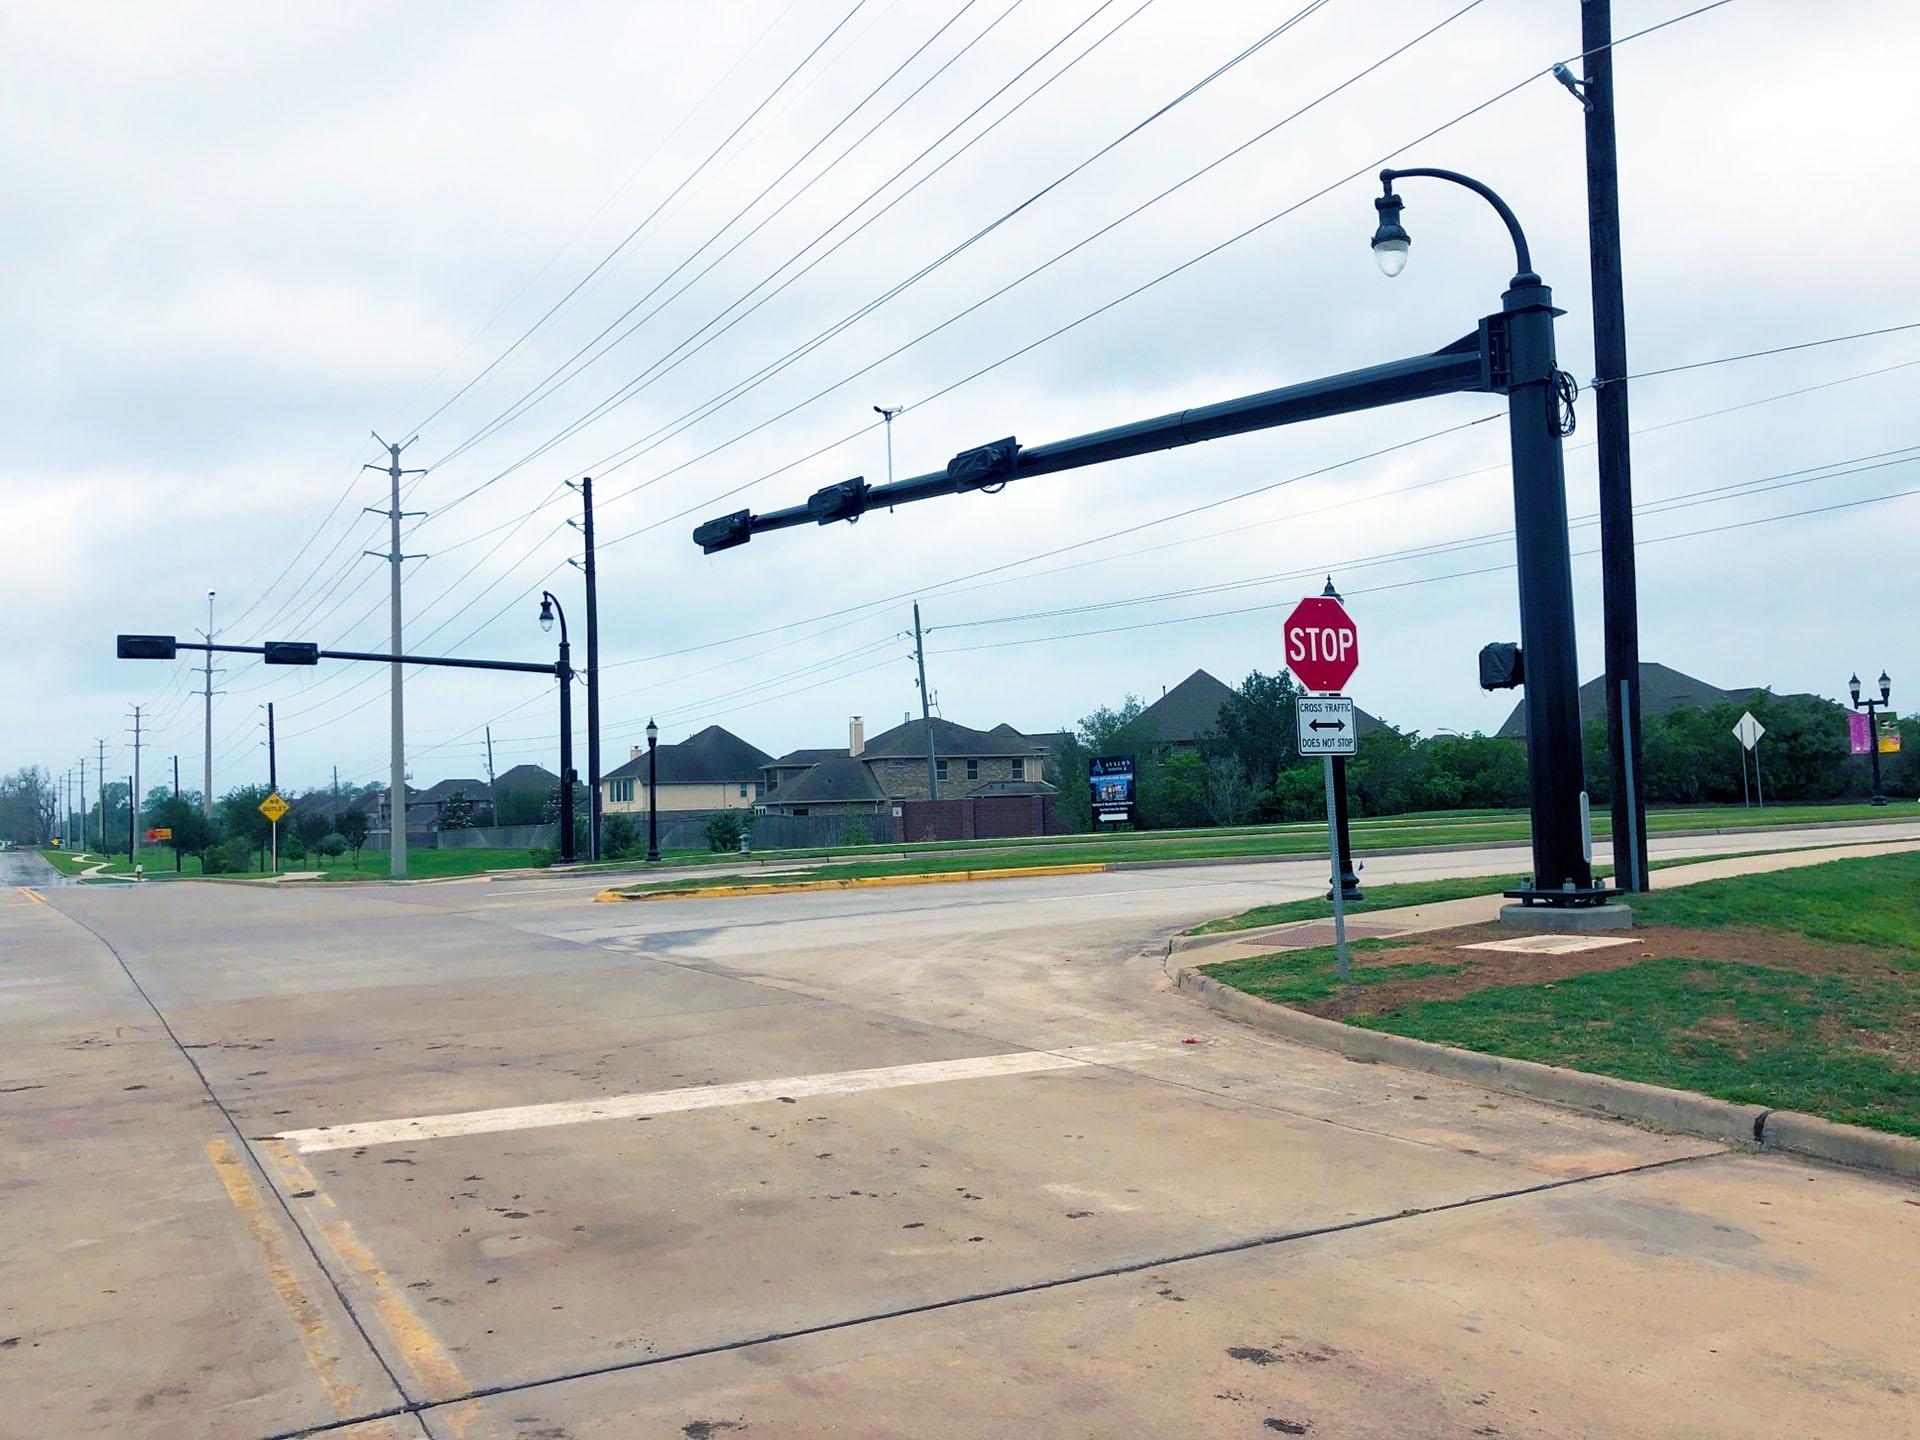 LJ Parkway at Hagerson Road Traffic Signal-Missouri City, Texas